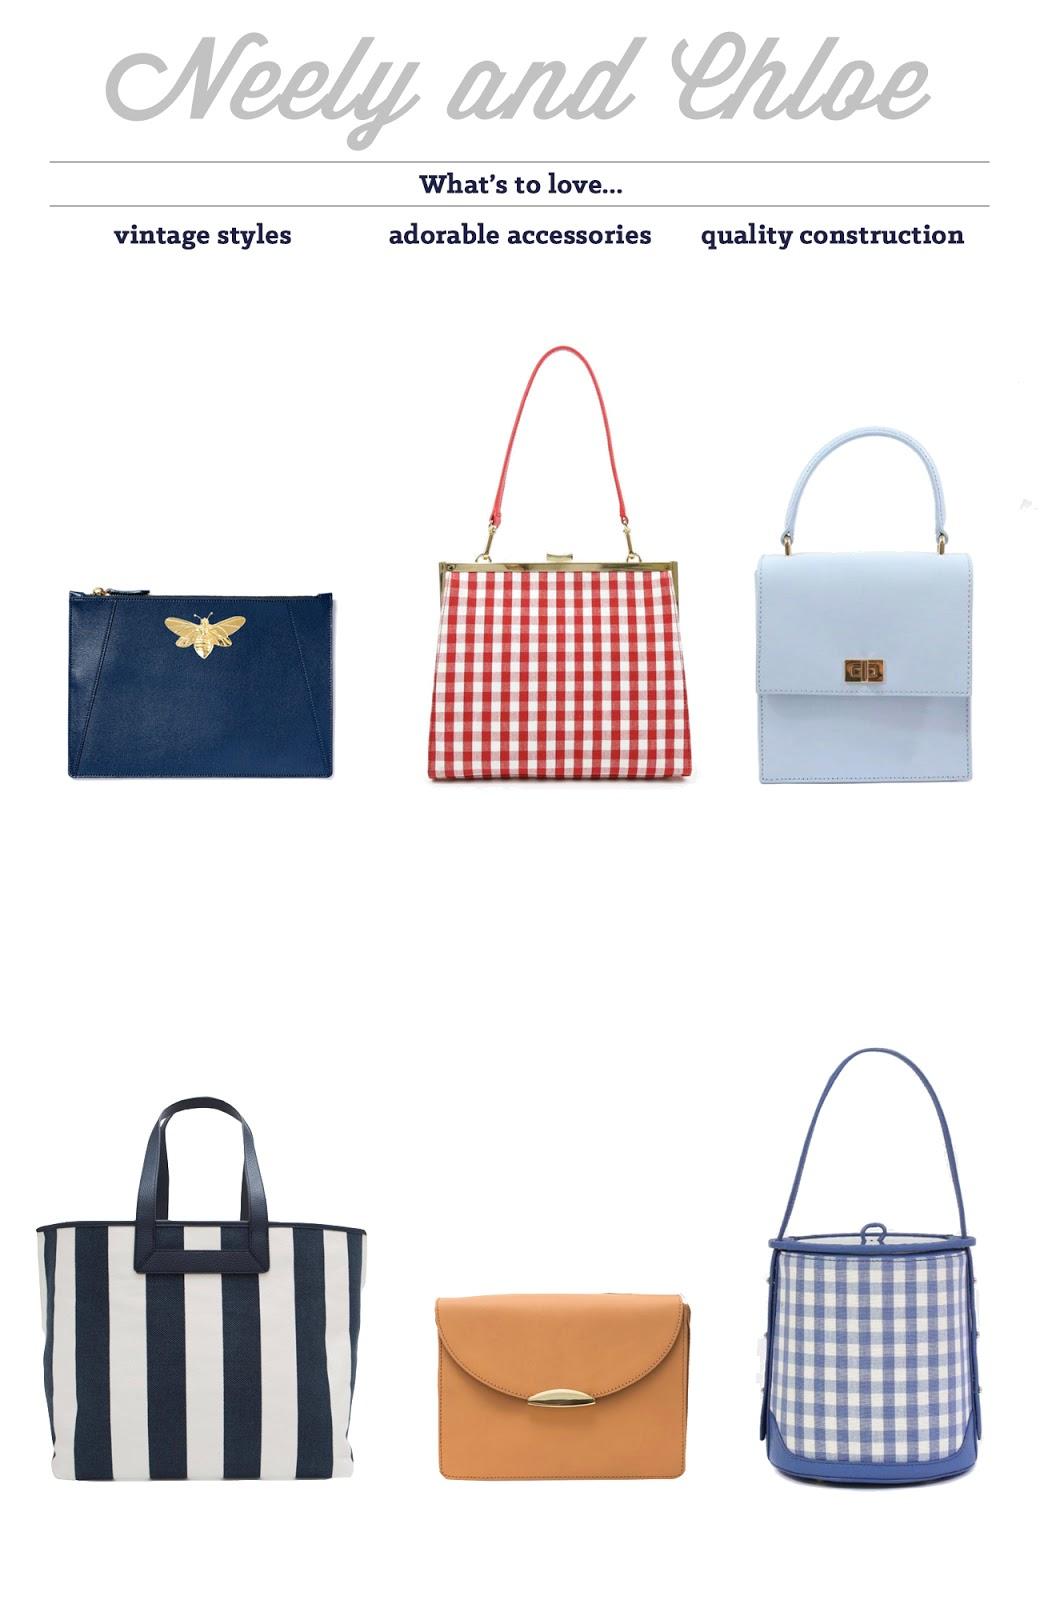 af854b4f1e 43 The Frame Bag Gingham // No. 19 The Mini Lady Bag in Saffiano Row Two: No.  22 The Beach Tote Pebble // No. 6 The Crossbody Soft // No.